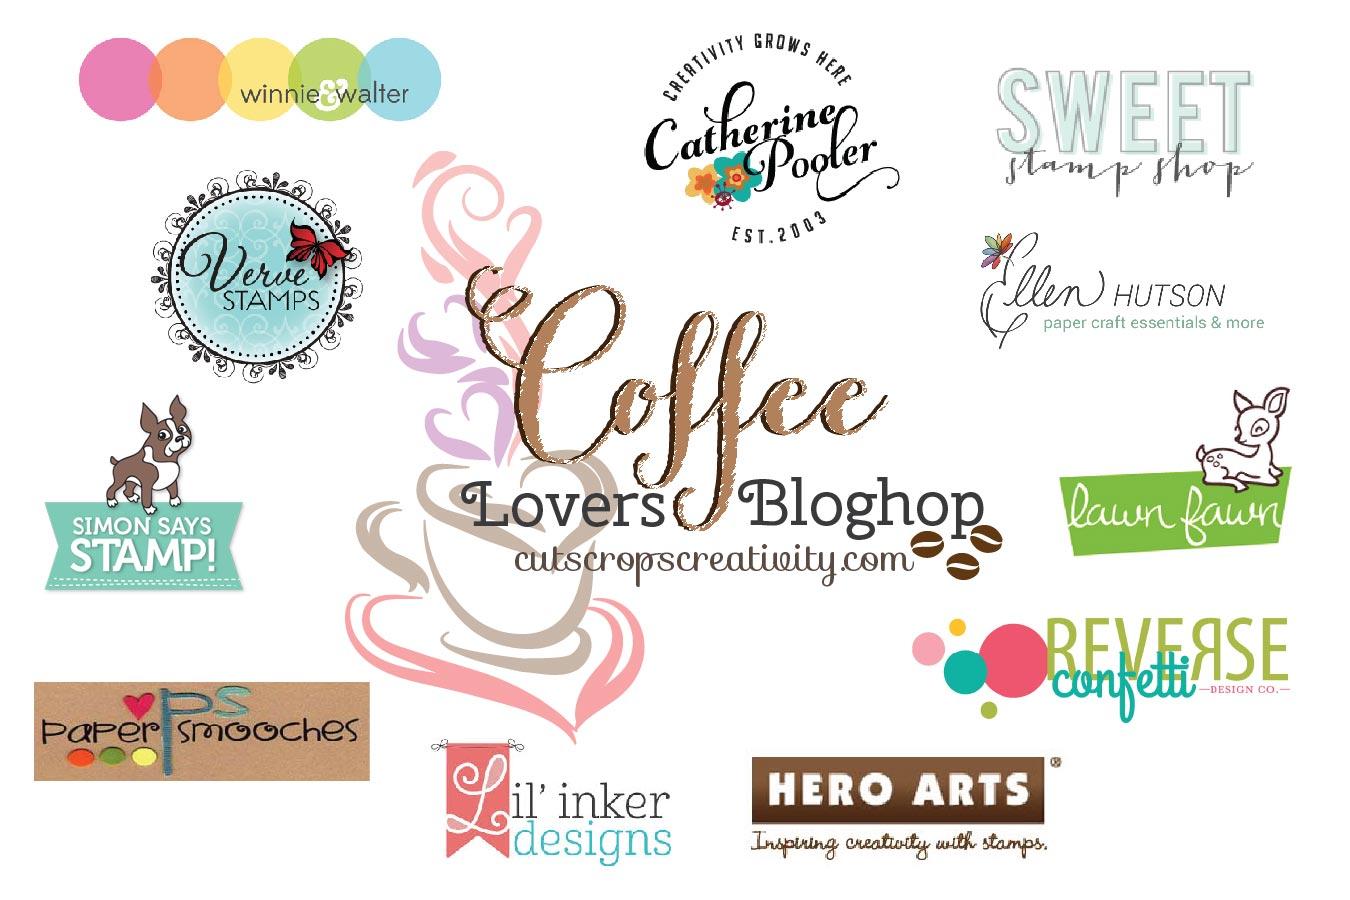 http://cutscropscreativity.com/2014/09/coffee-lovers-bloghop-2/